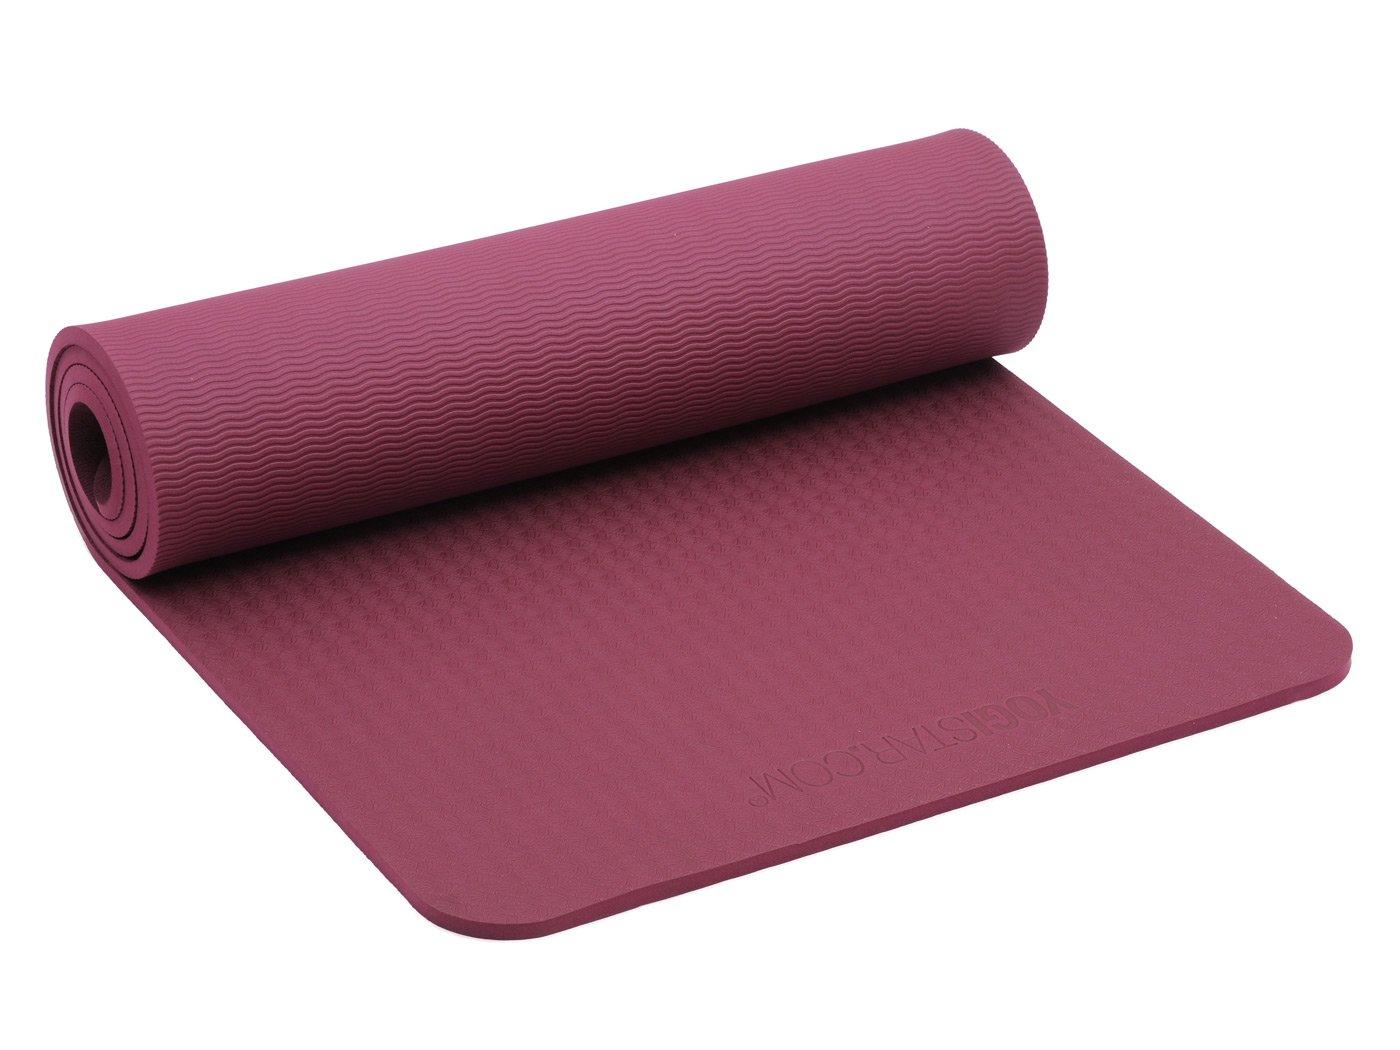 Yogistar Fitnessmatte Gym Fitness-//gymnastikmatte